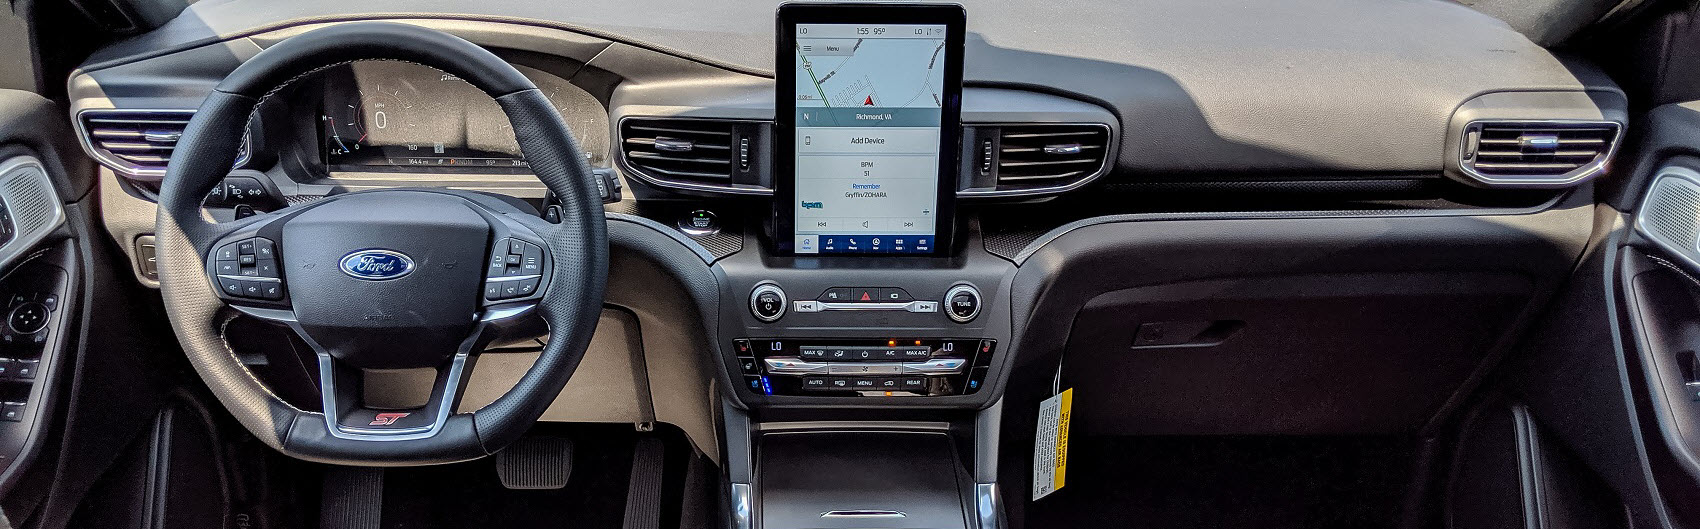 2020 ford explorer interior richmond va   richmond ford